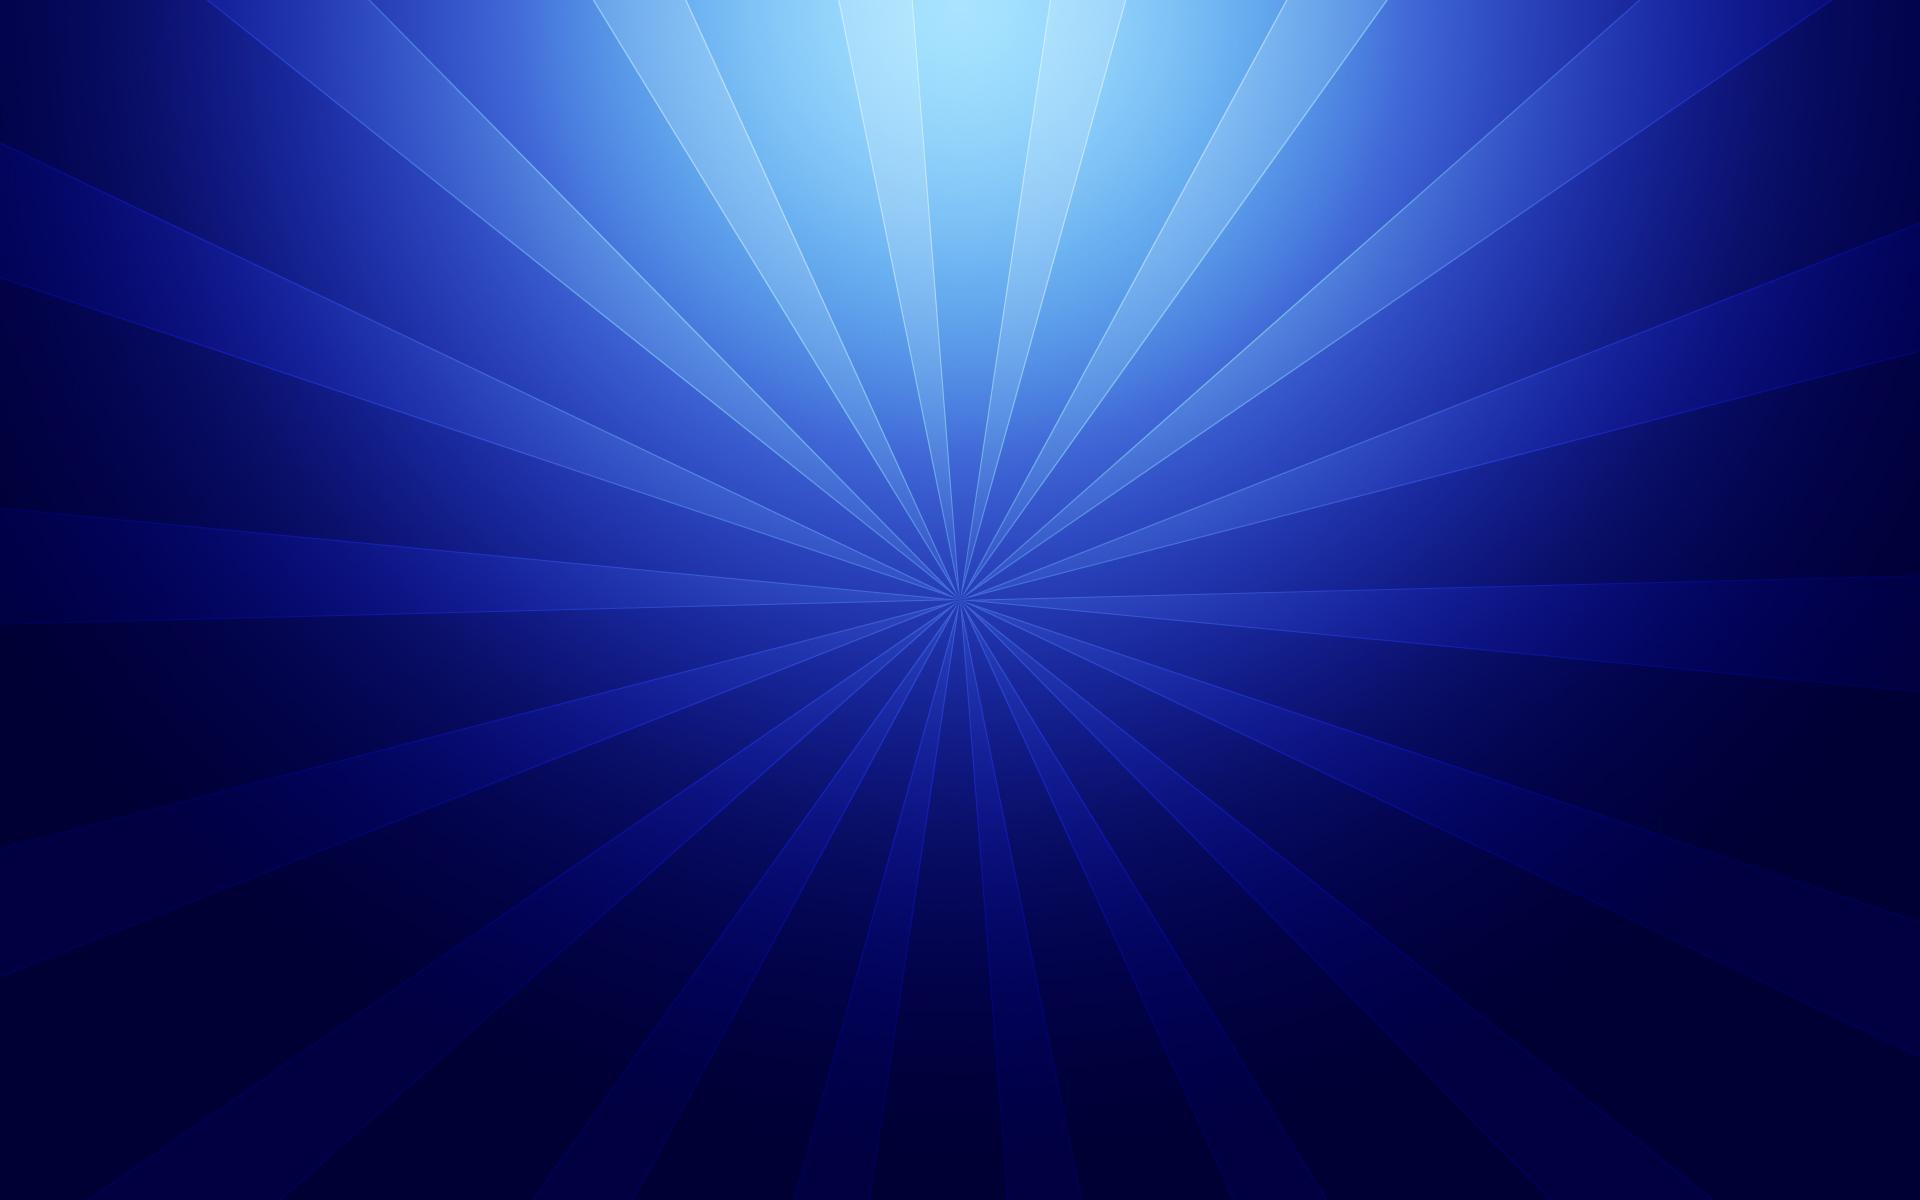 Windows 7 Beta wallpaper 43296 1920x1200